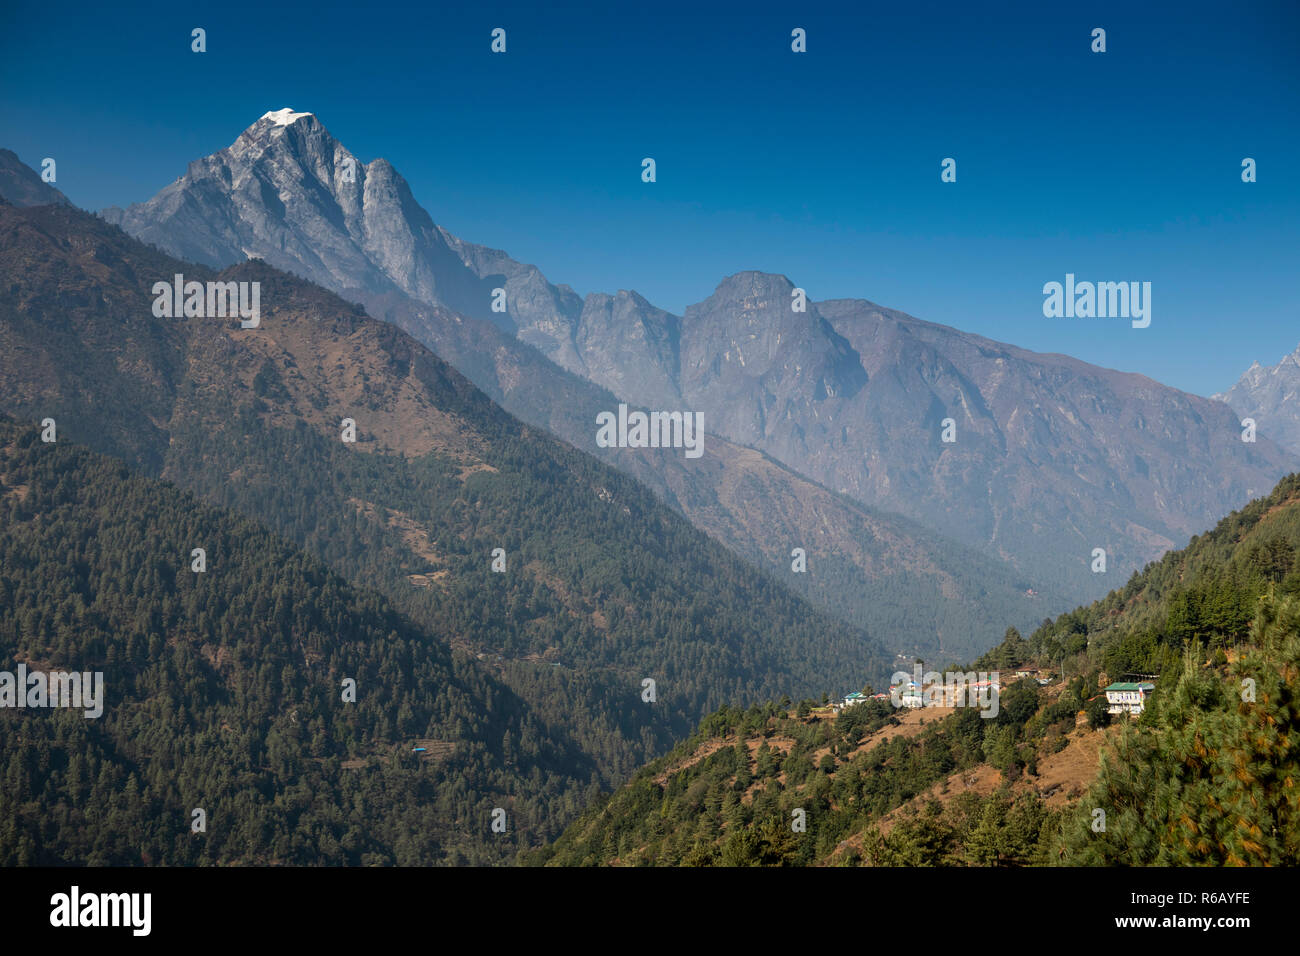 Nepal, Lukla, Chheplung, Mt Solu Khumbu above Dudh Khosi Valley at start of Everest Base Camp Trek - Stock Image